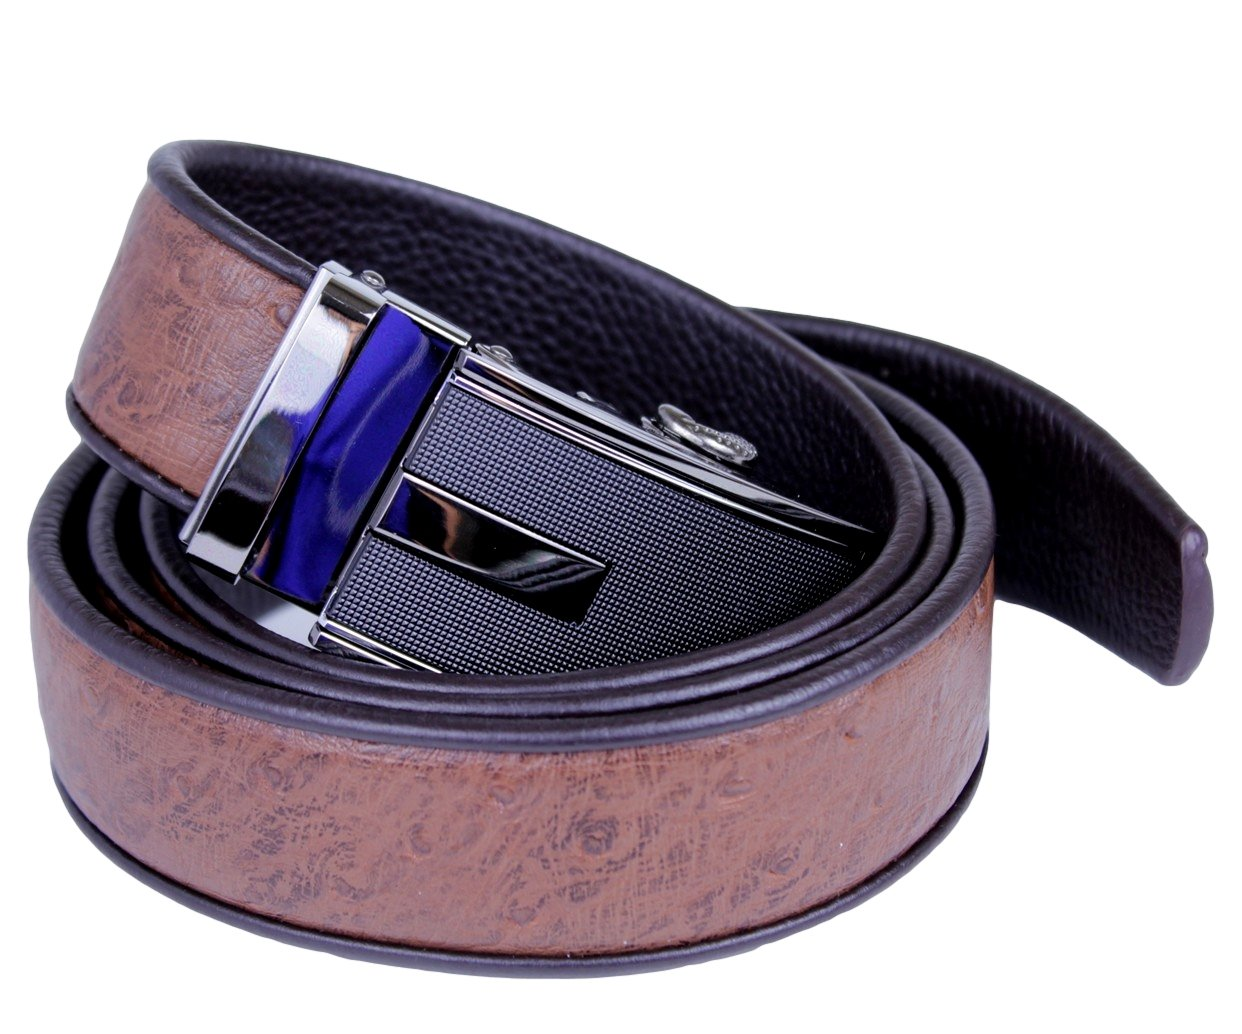 Mooniva Men's Leather Ratchet Belt Luxury Collection XX-Large (43''- 46'') Black